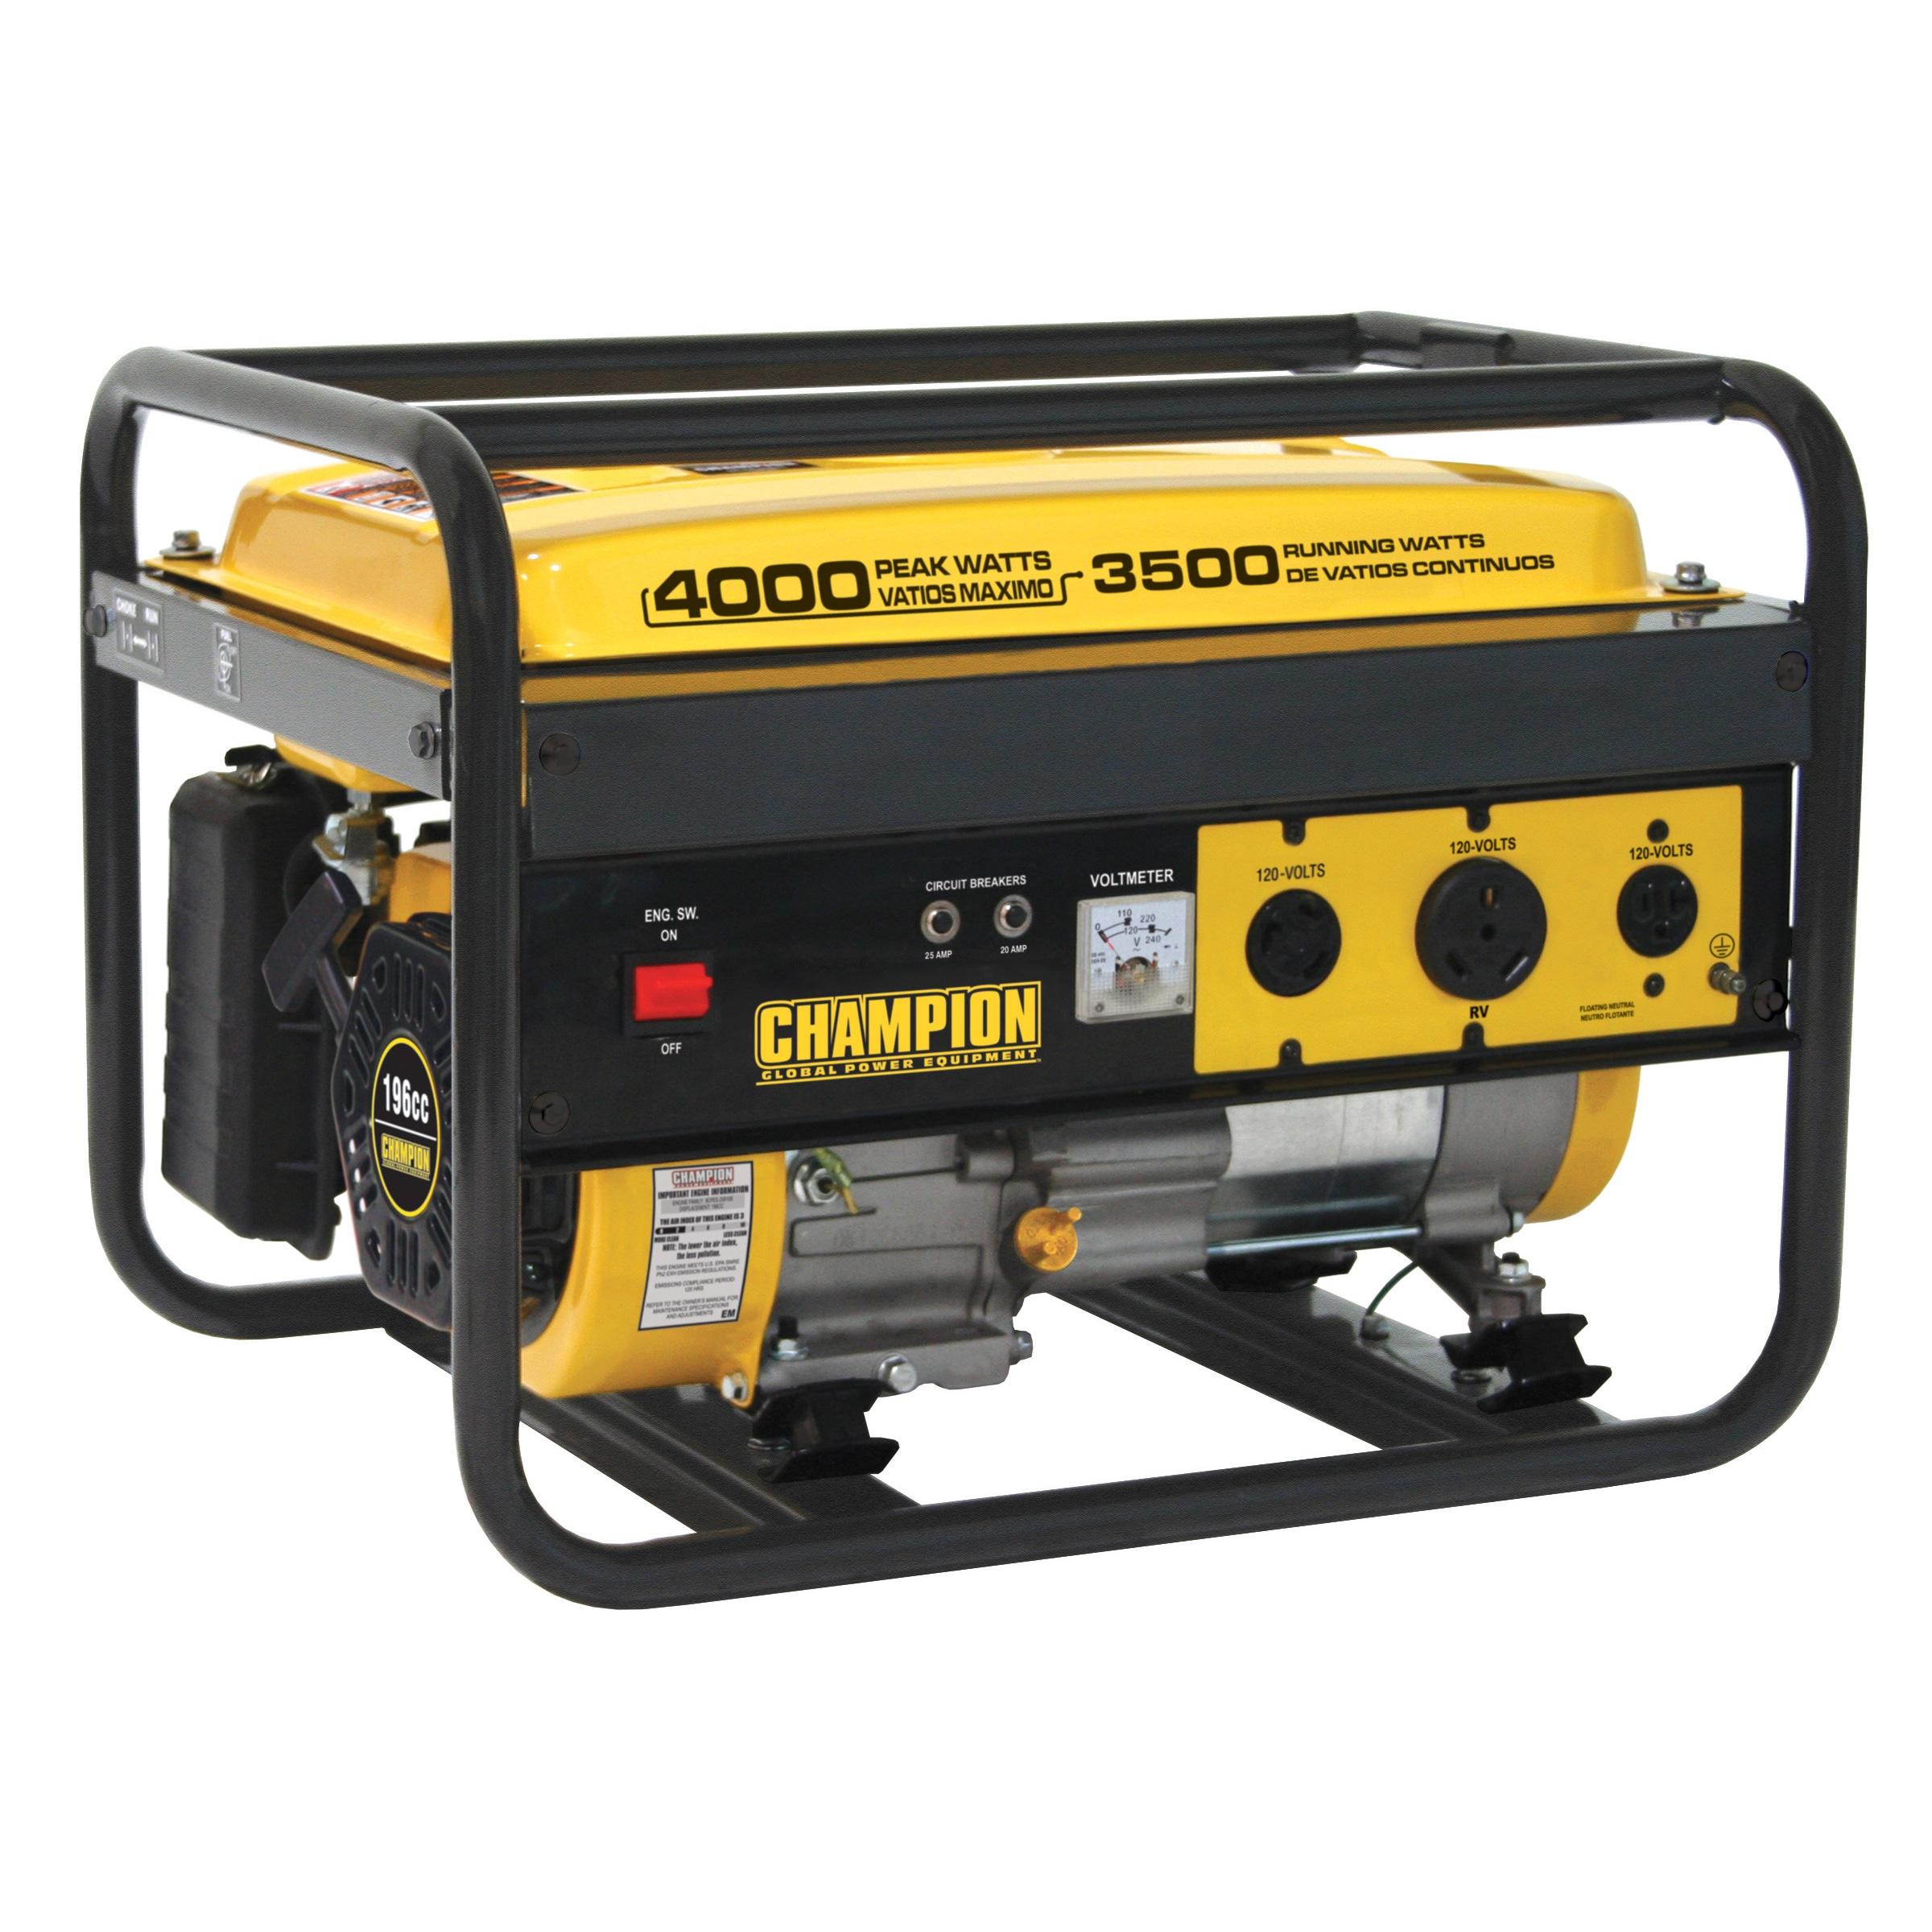 Portable Generator 3500 Watt RV Gasoline Powered Outdoor Emergency